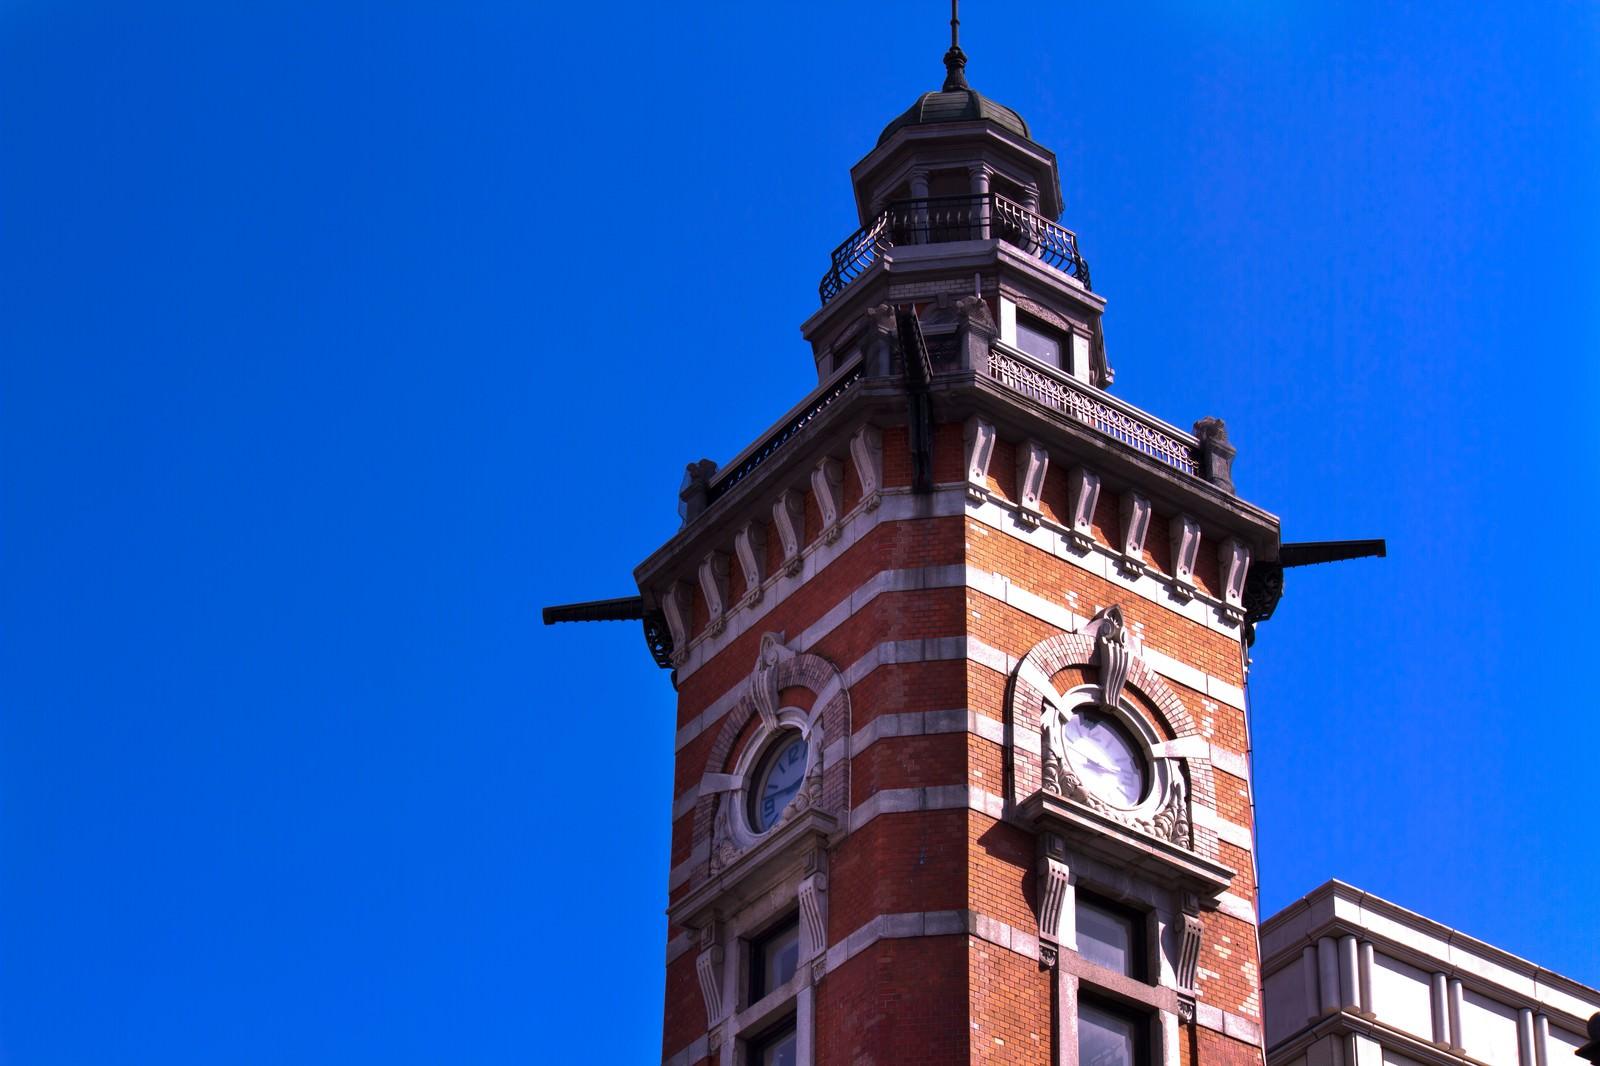 「横浜開港記念館の時計塔」の写真